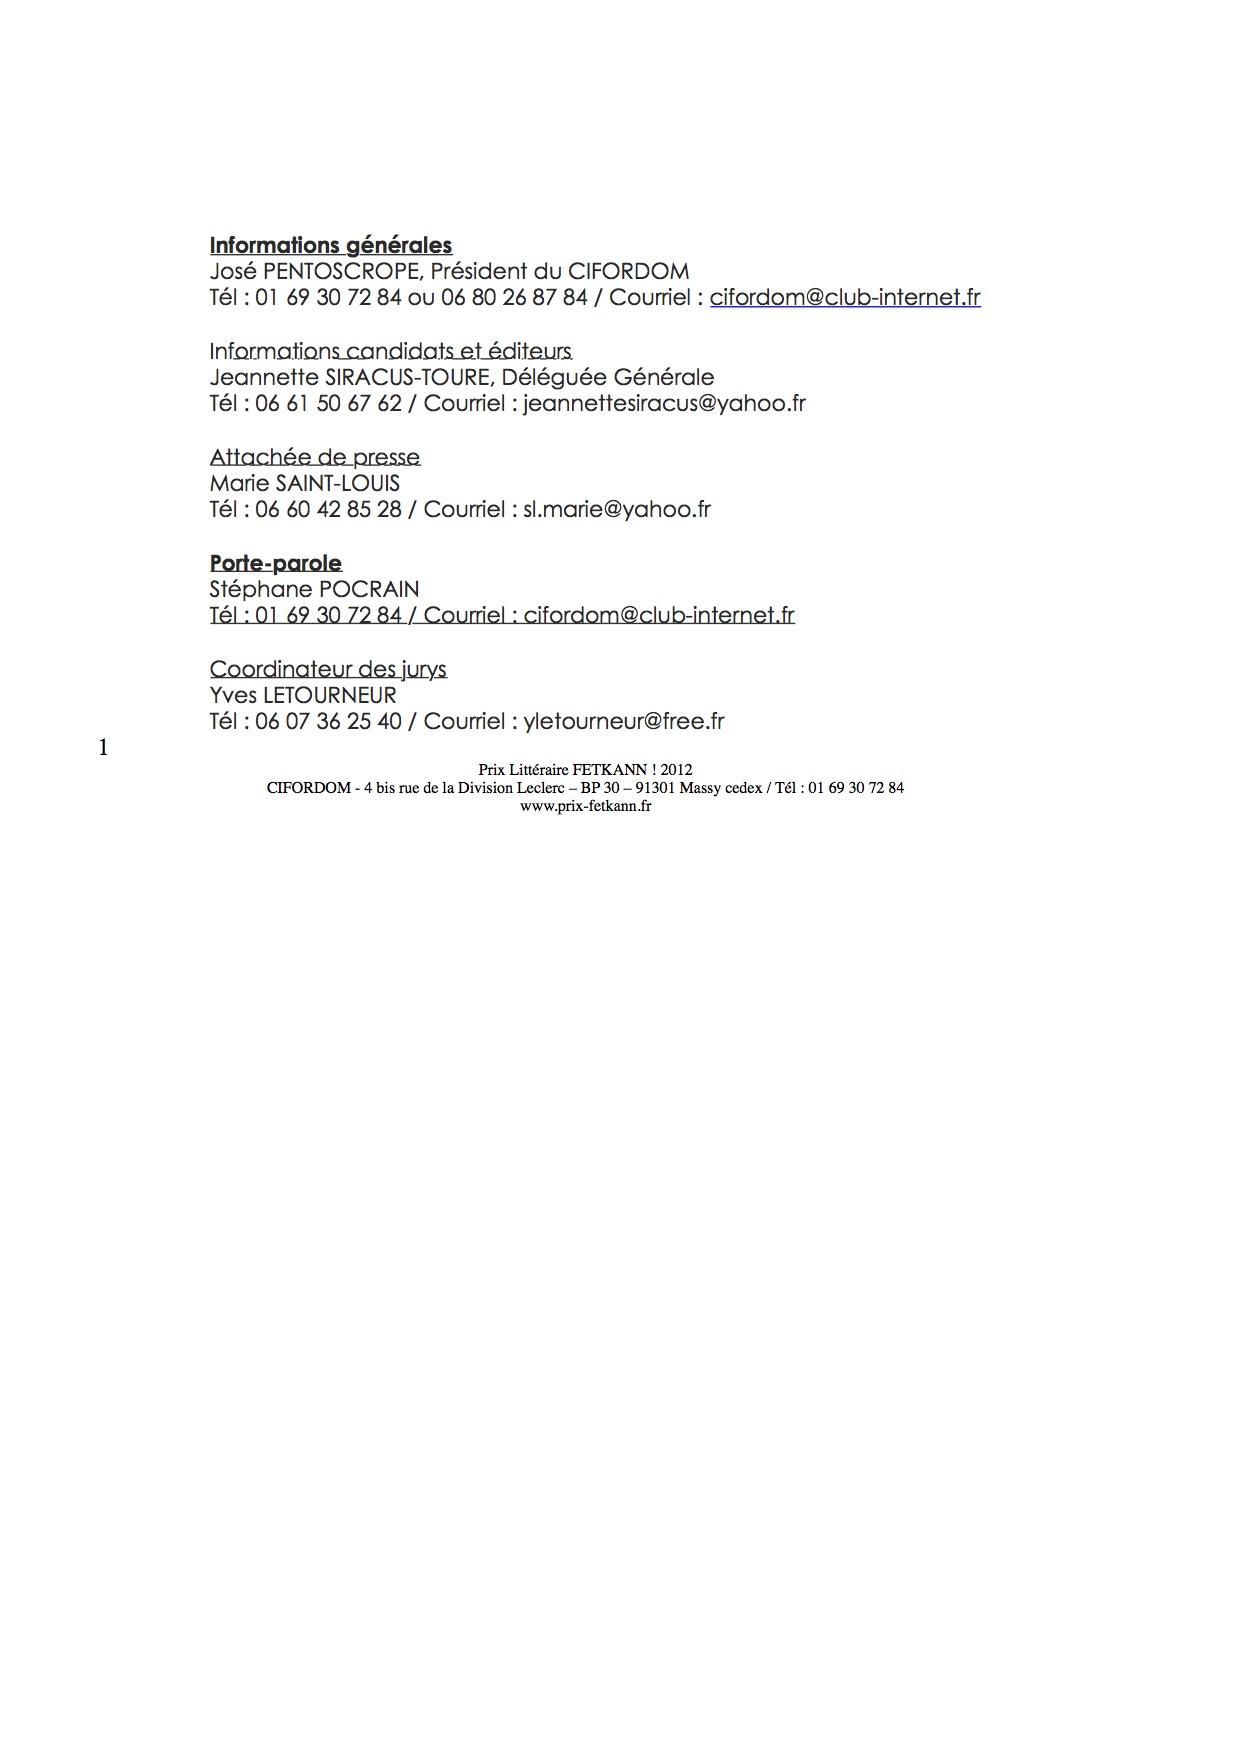 CP Prix_FETKANN_Pressentis 2012-3